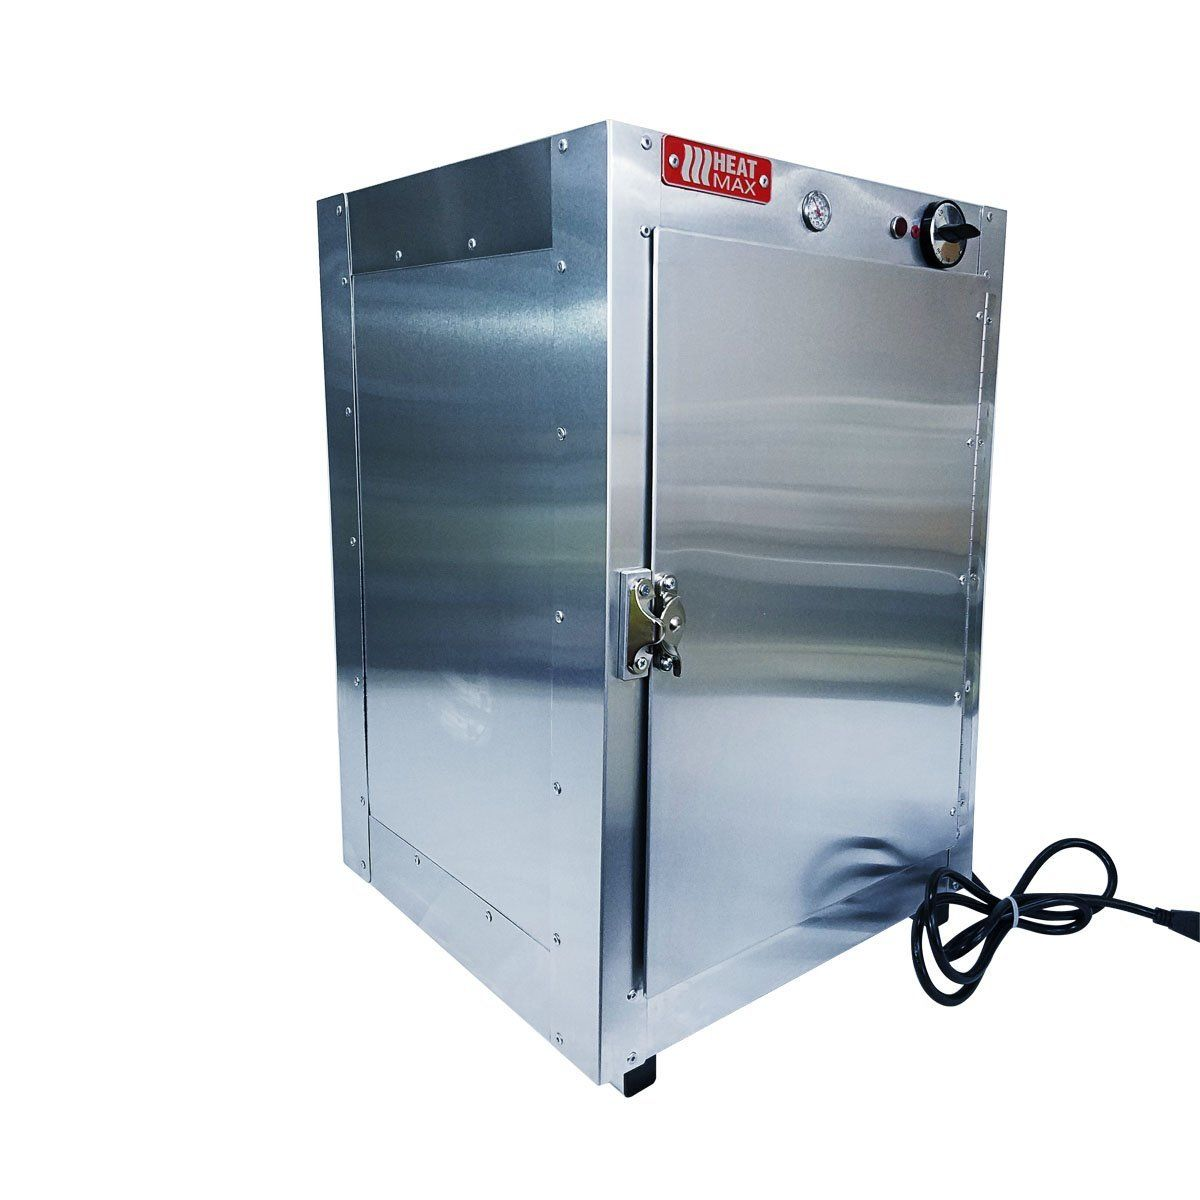 HeatMax Commercial Food Pastry Warming Case Aluminum 16x16x24 Hot ...